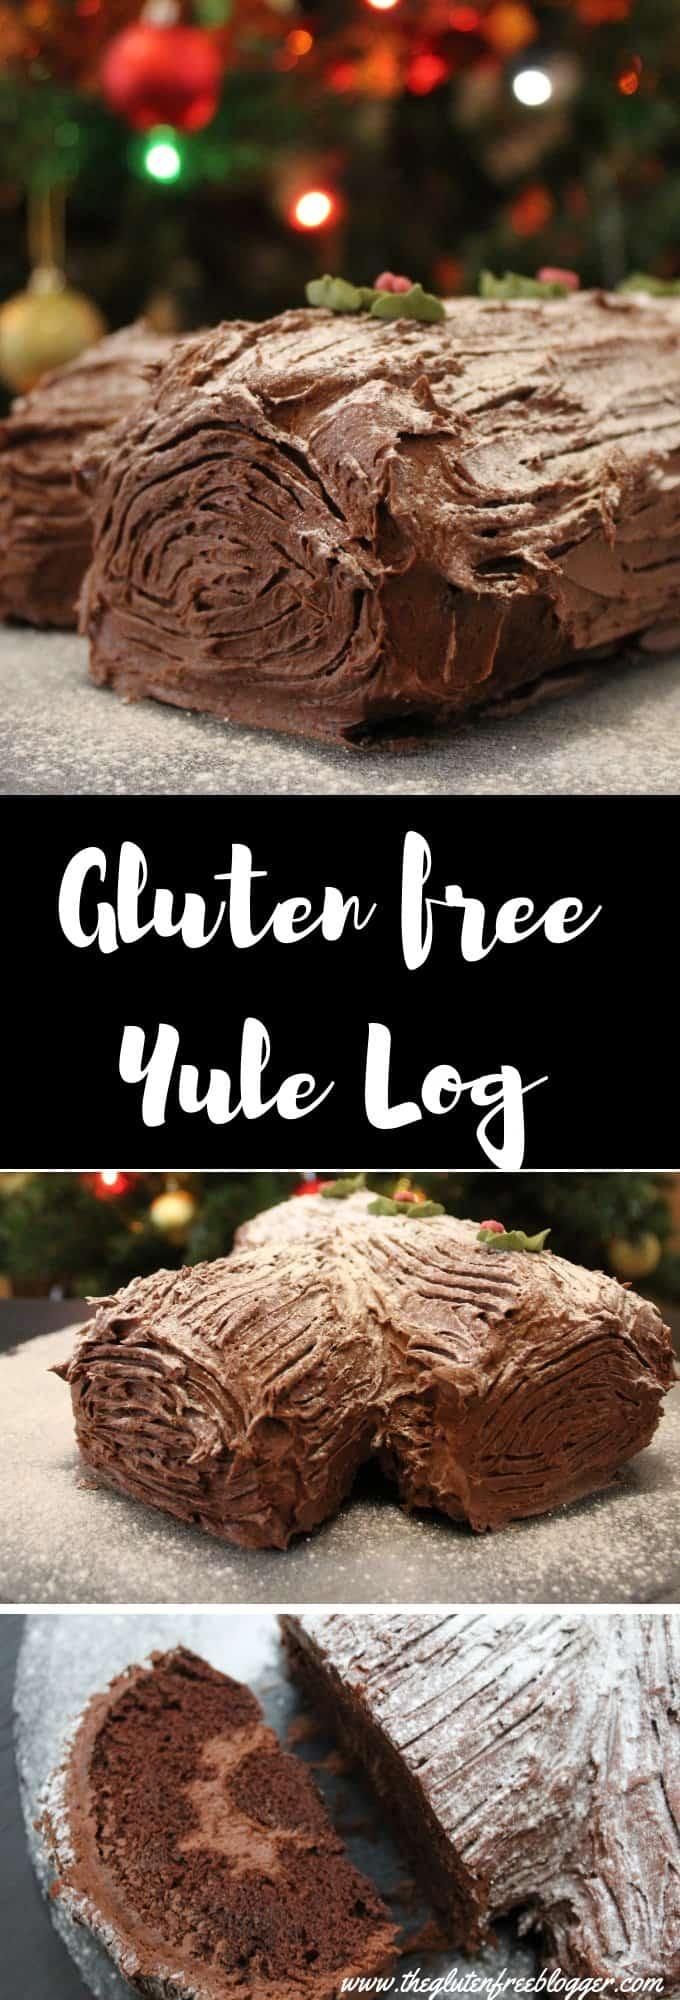 gluten free yule log recipe - christmas recipe - gluten free christmas - coeliac